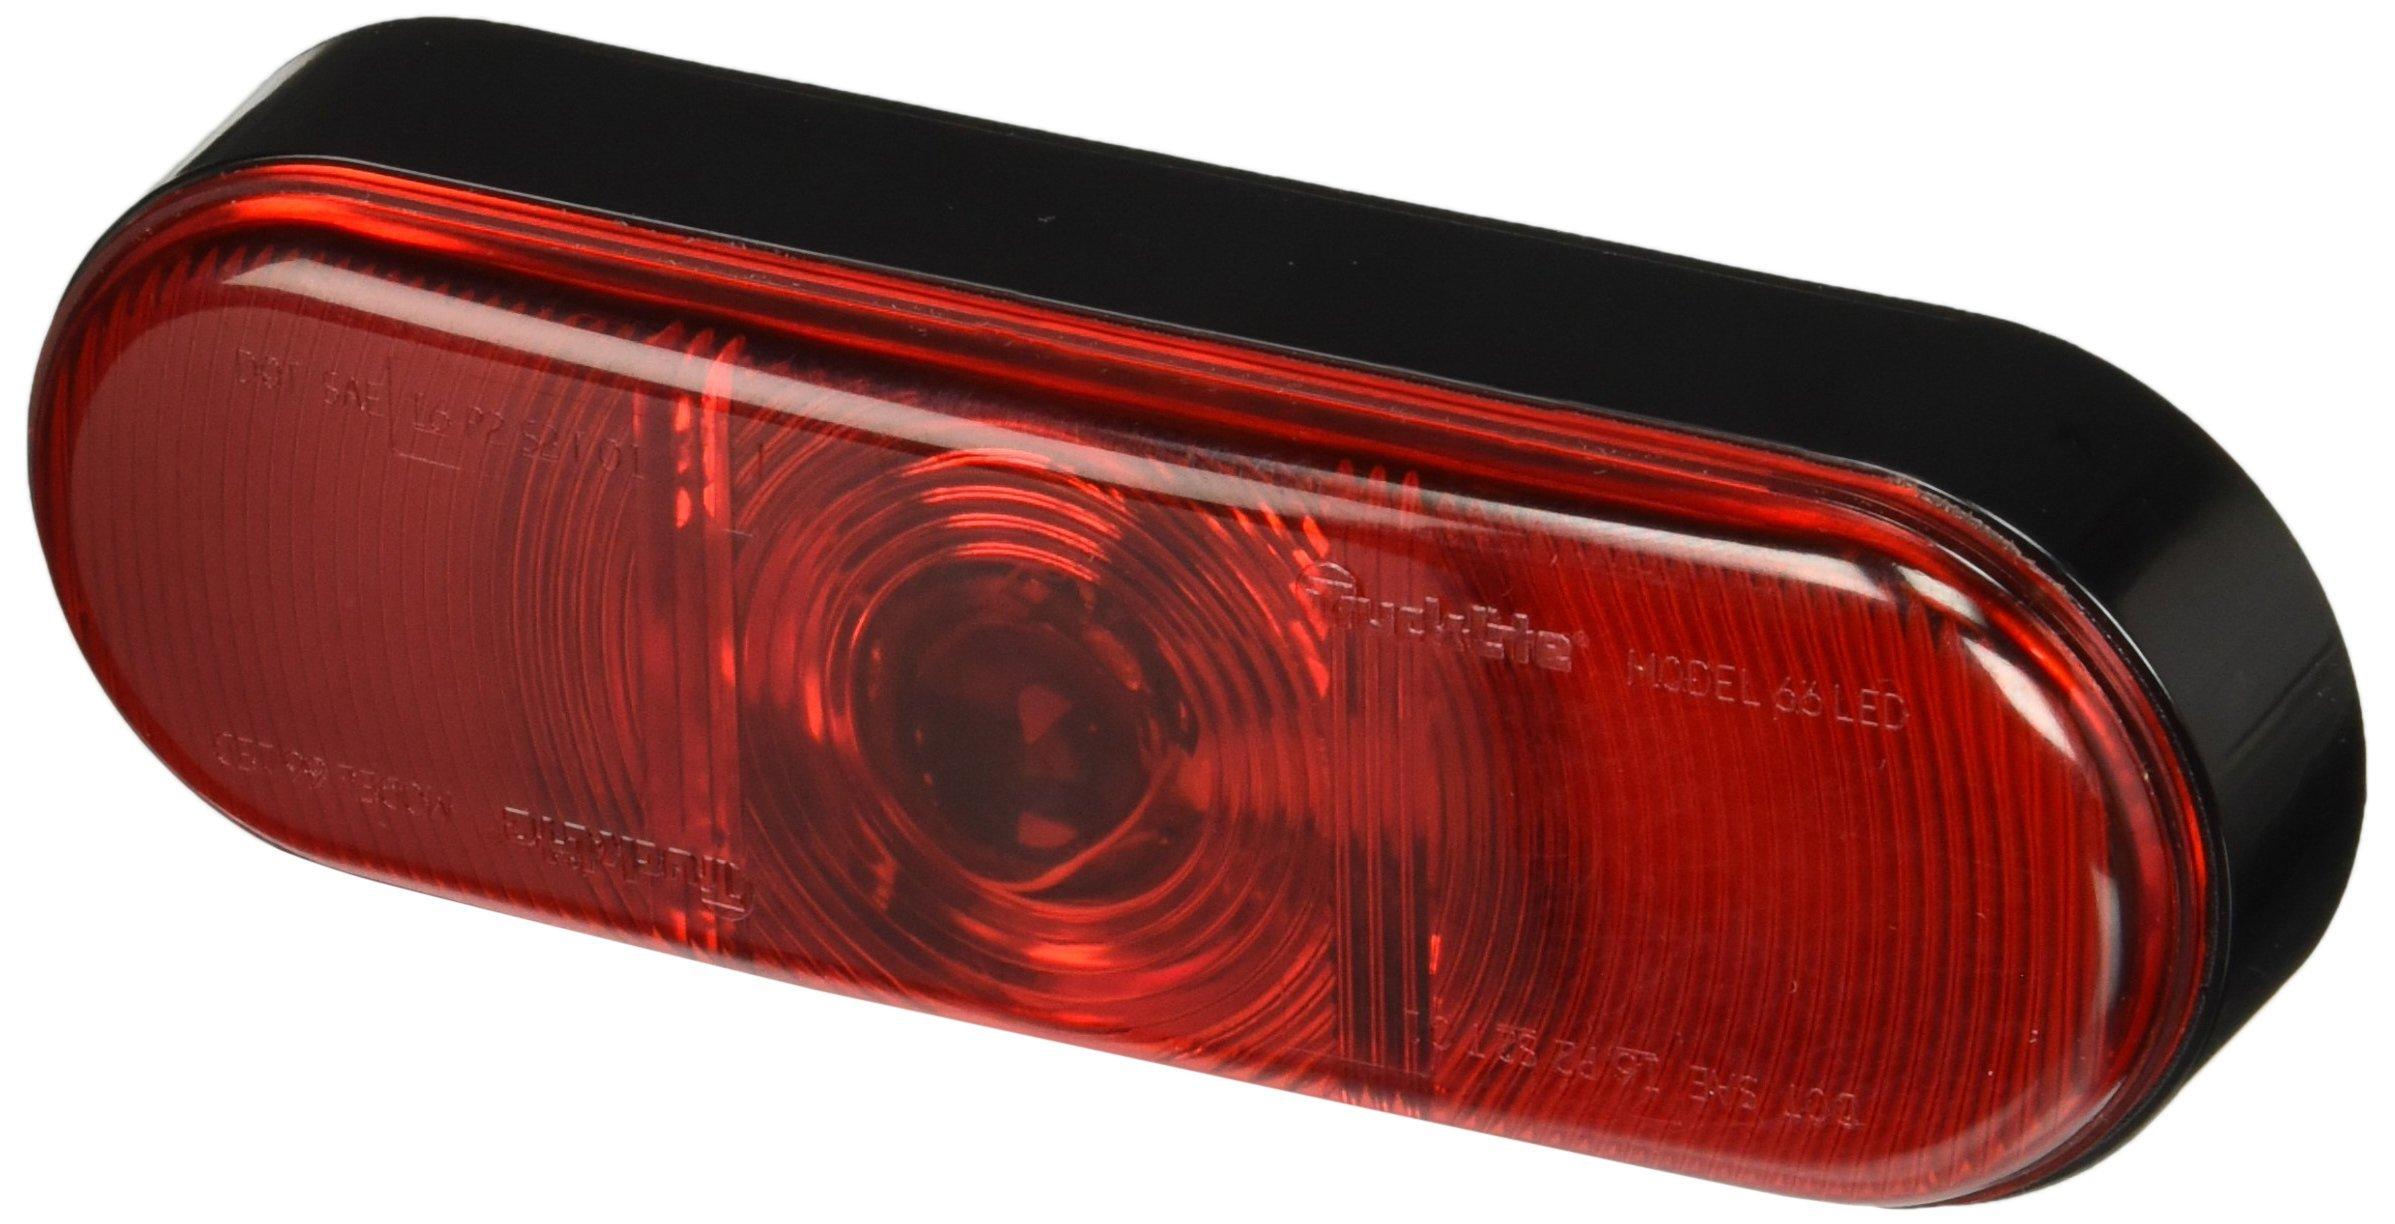 Truck-Lite (66250R) Stop/Turn/Tail LED Light Kit